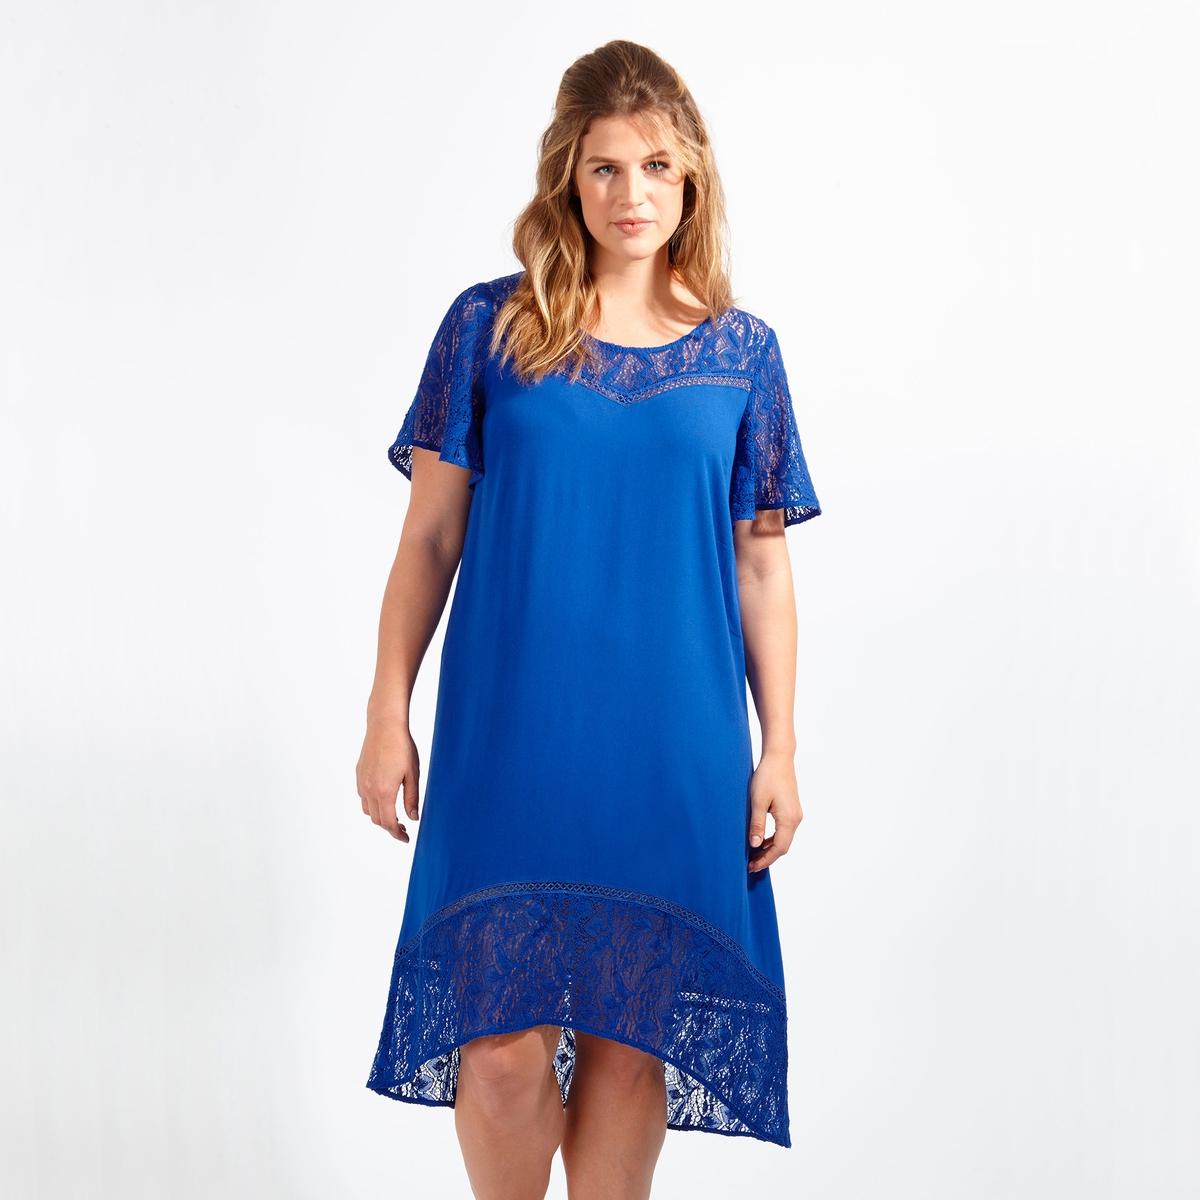 Платье<br><br>Цвет: синий<br>Размер: 44 (FR) - 50 (RUS).54/56 (FR) - 60/62 (RUS).50/52 (FR) - 56/58 (RUS).48 (FR) - 54 (RUS)